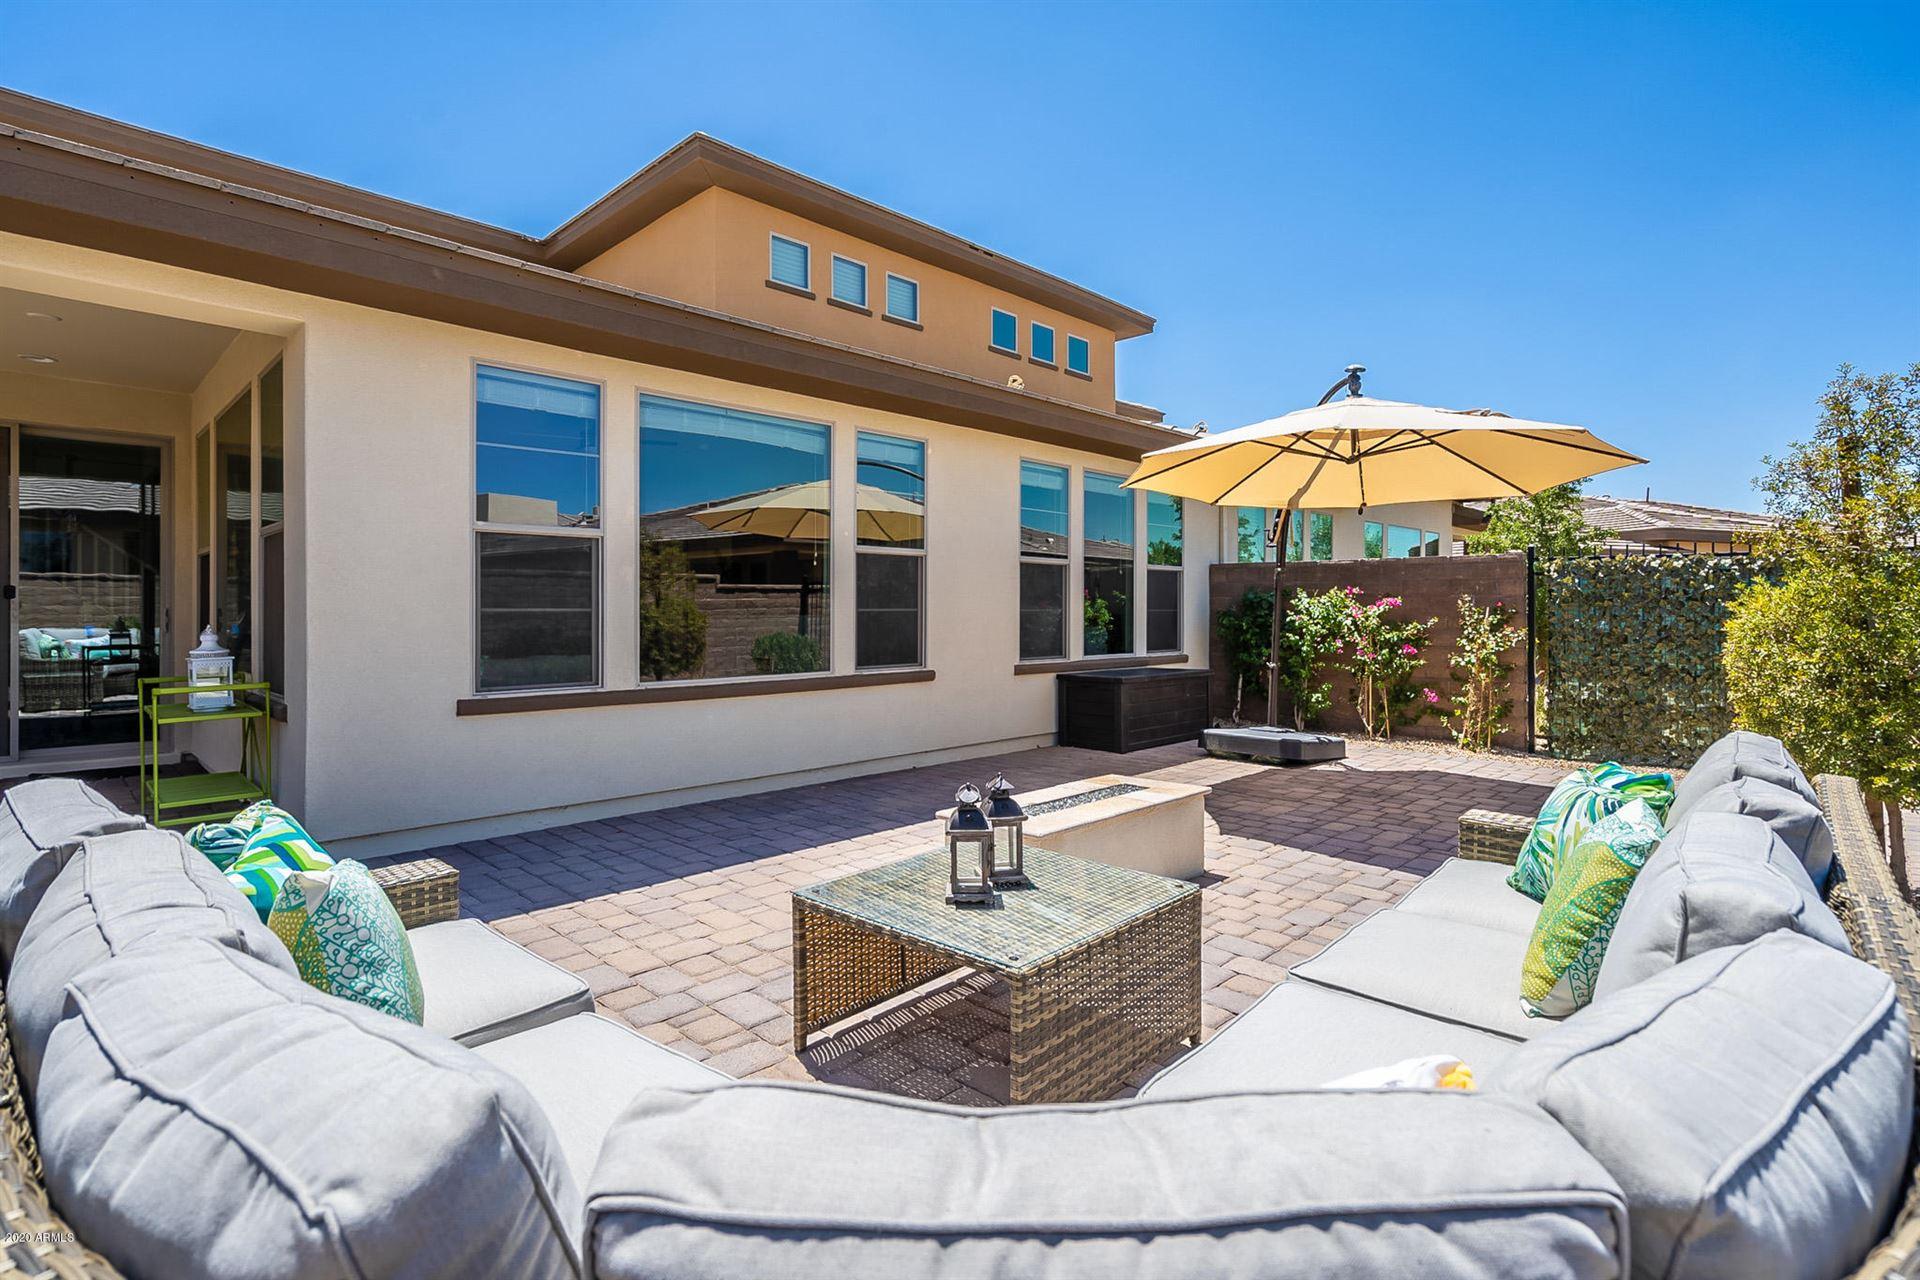 934 E COBBLE STONE Drive, Queen Creek, AZ 85140 - MLS#: 6112331